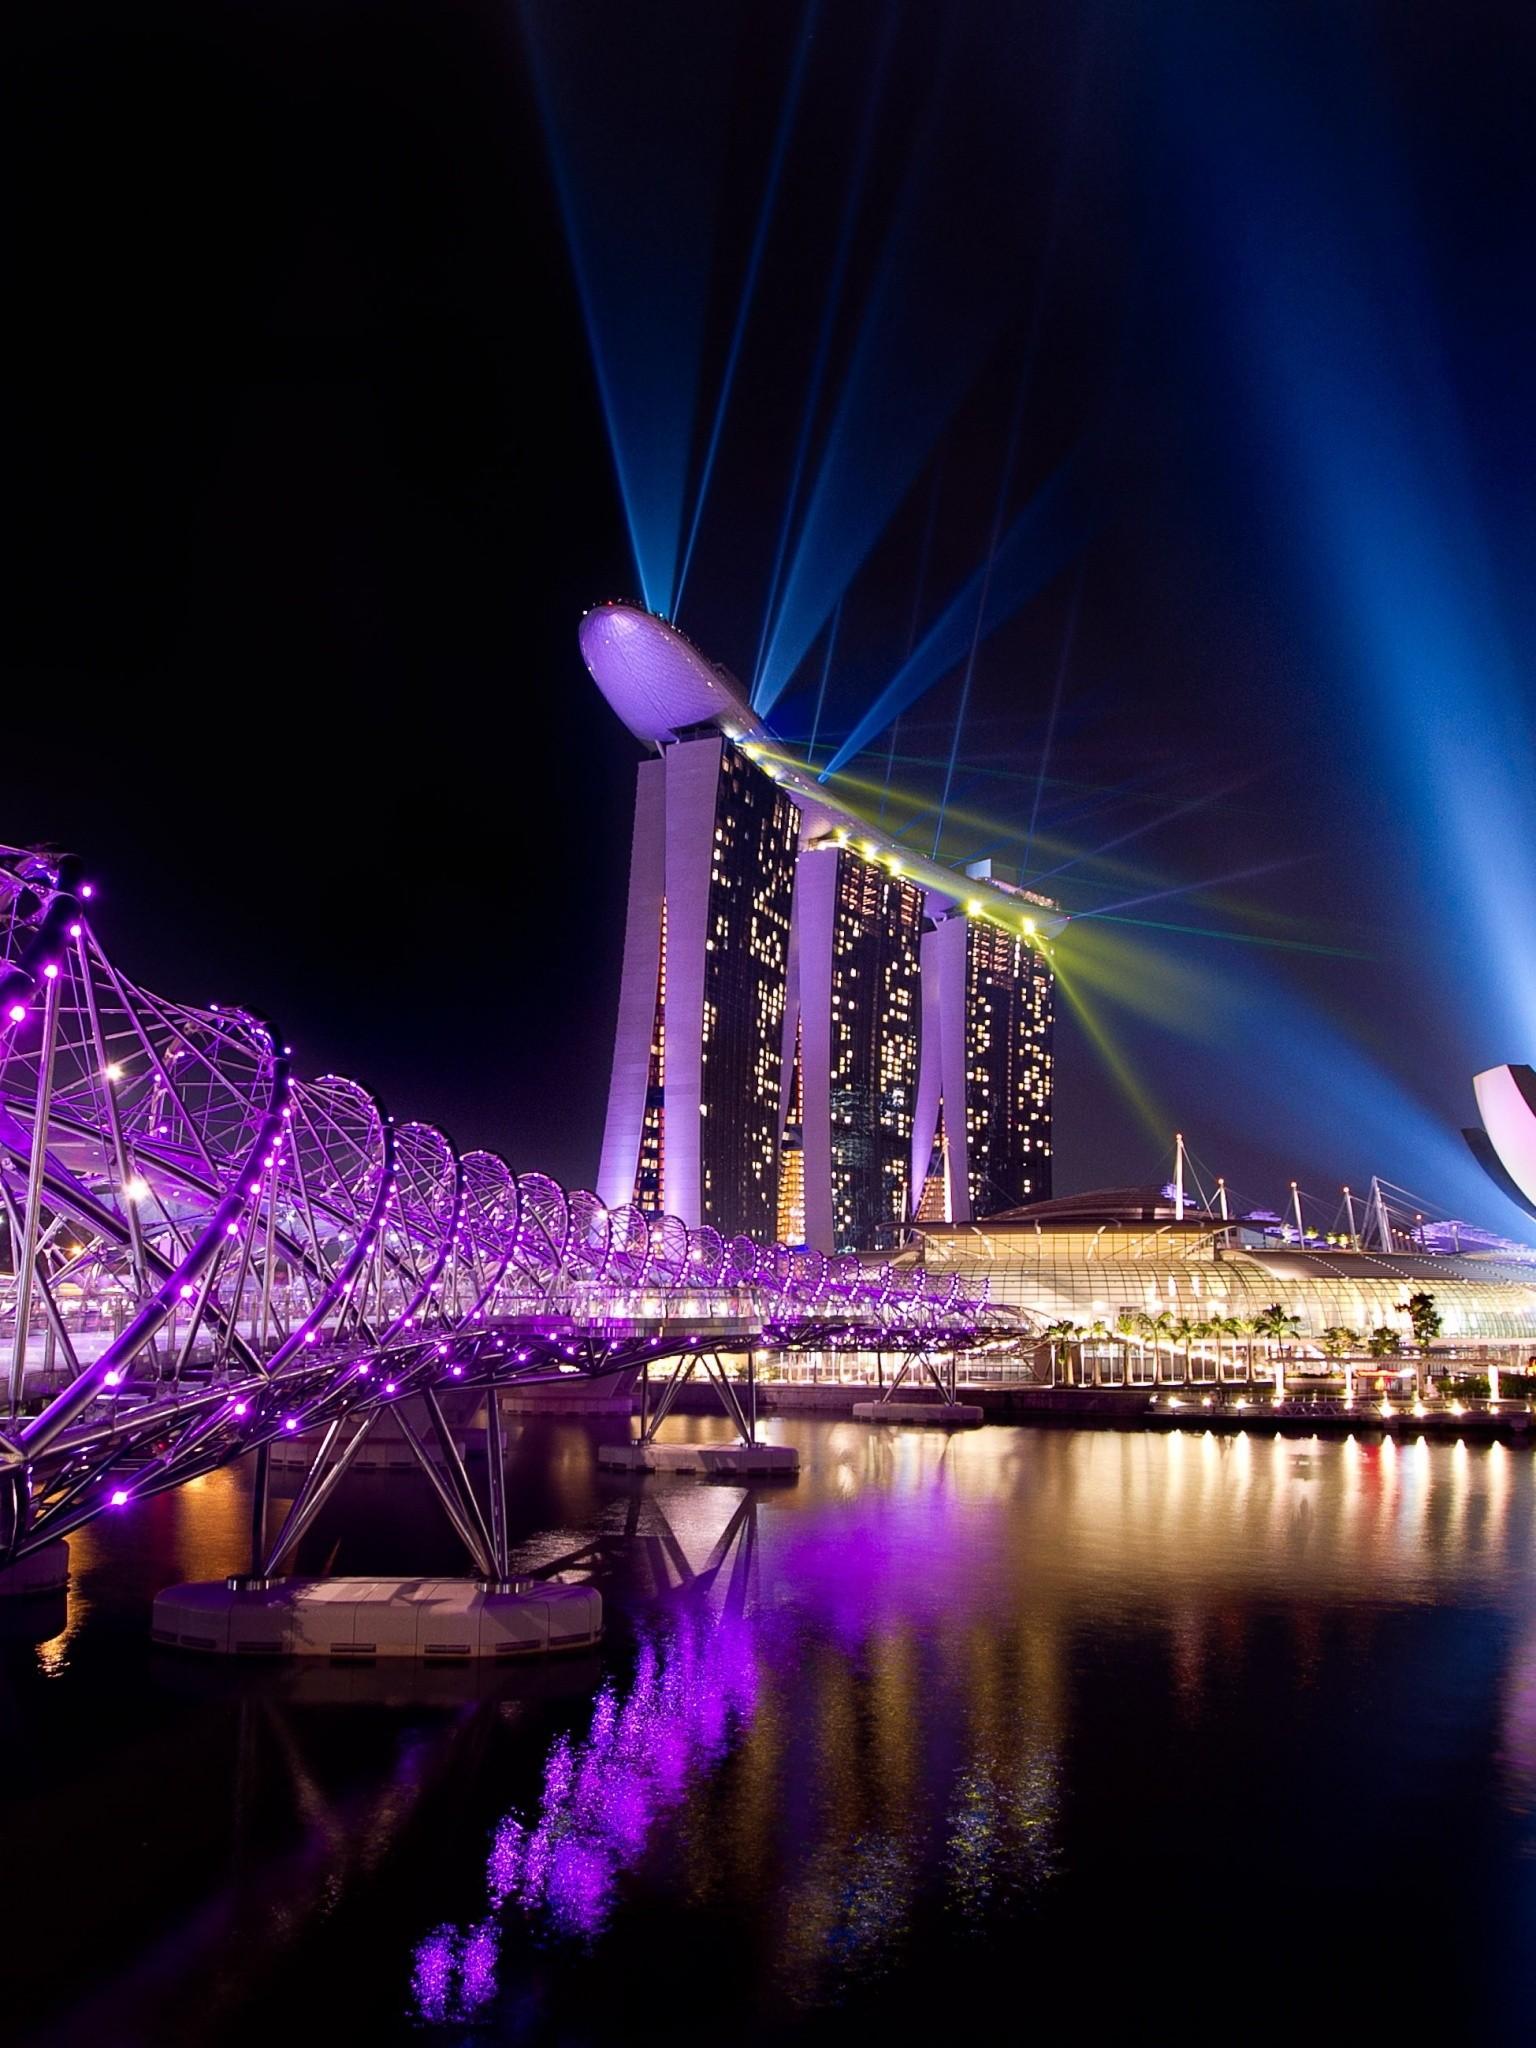 Singapore City Night Lights Wallpaper 1536x2048